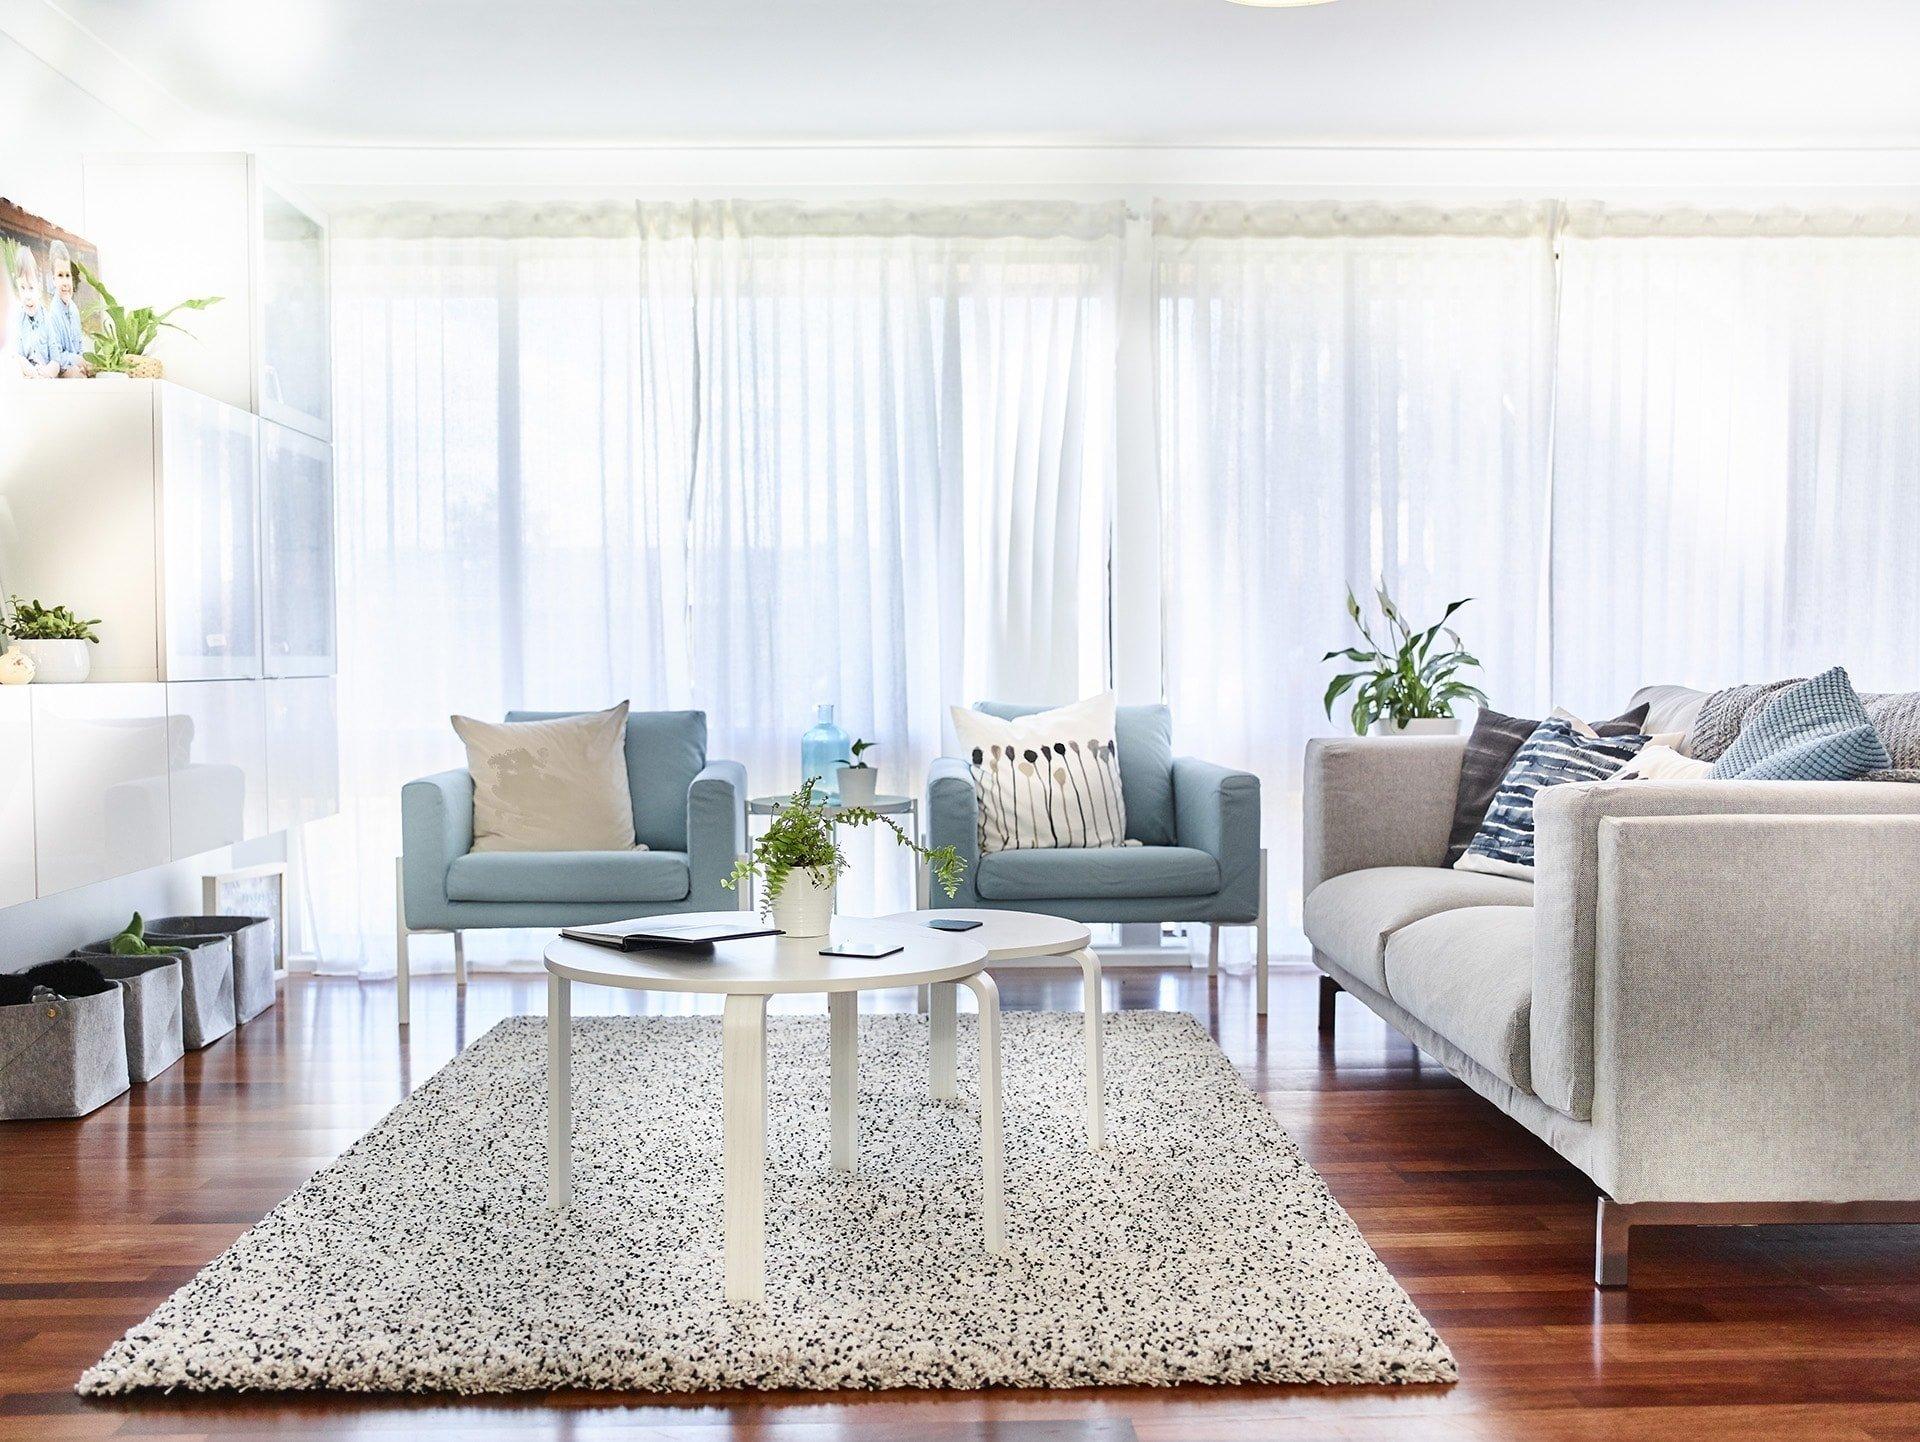 light blue ikea armchairs and grey sofa in living room with ikea shag rug